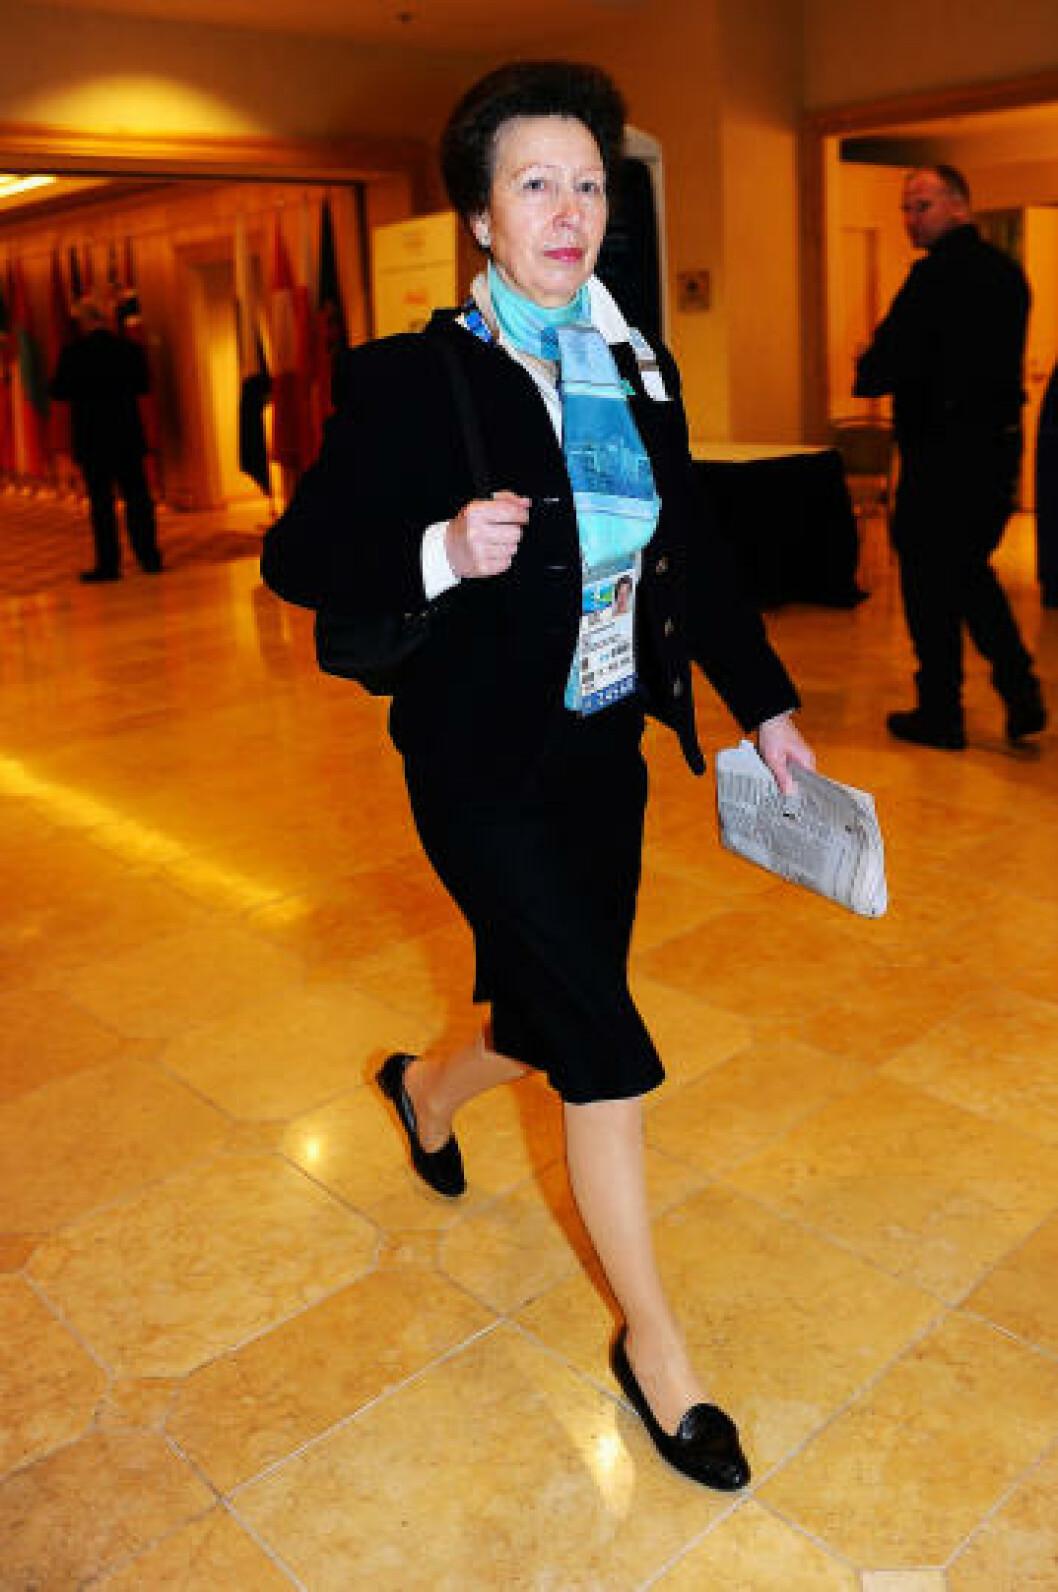 SPORTSINTERESSERT PRINSESSE: Storbritannias prinsesse Anne (59) ankommer Vancouver. Foto: Scanpix